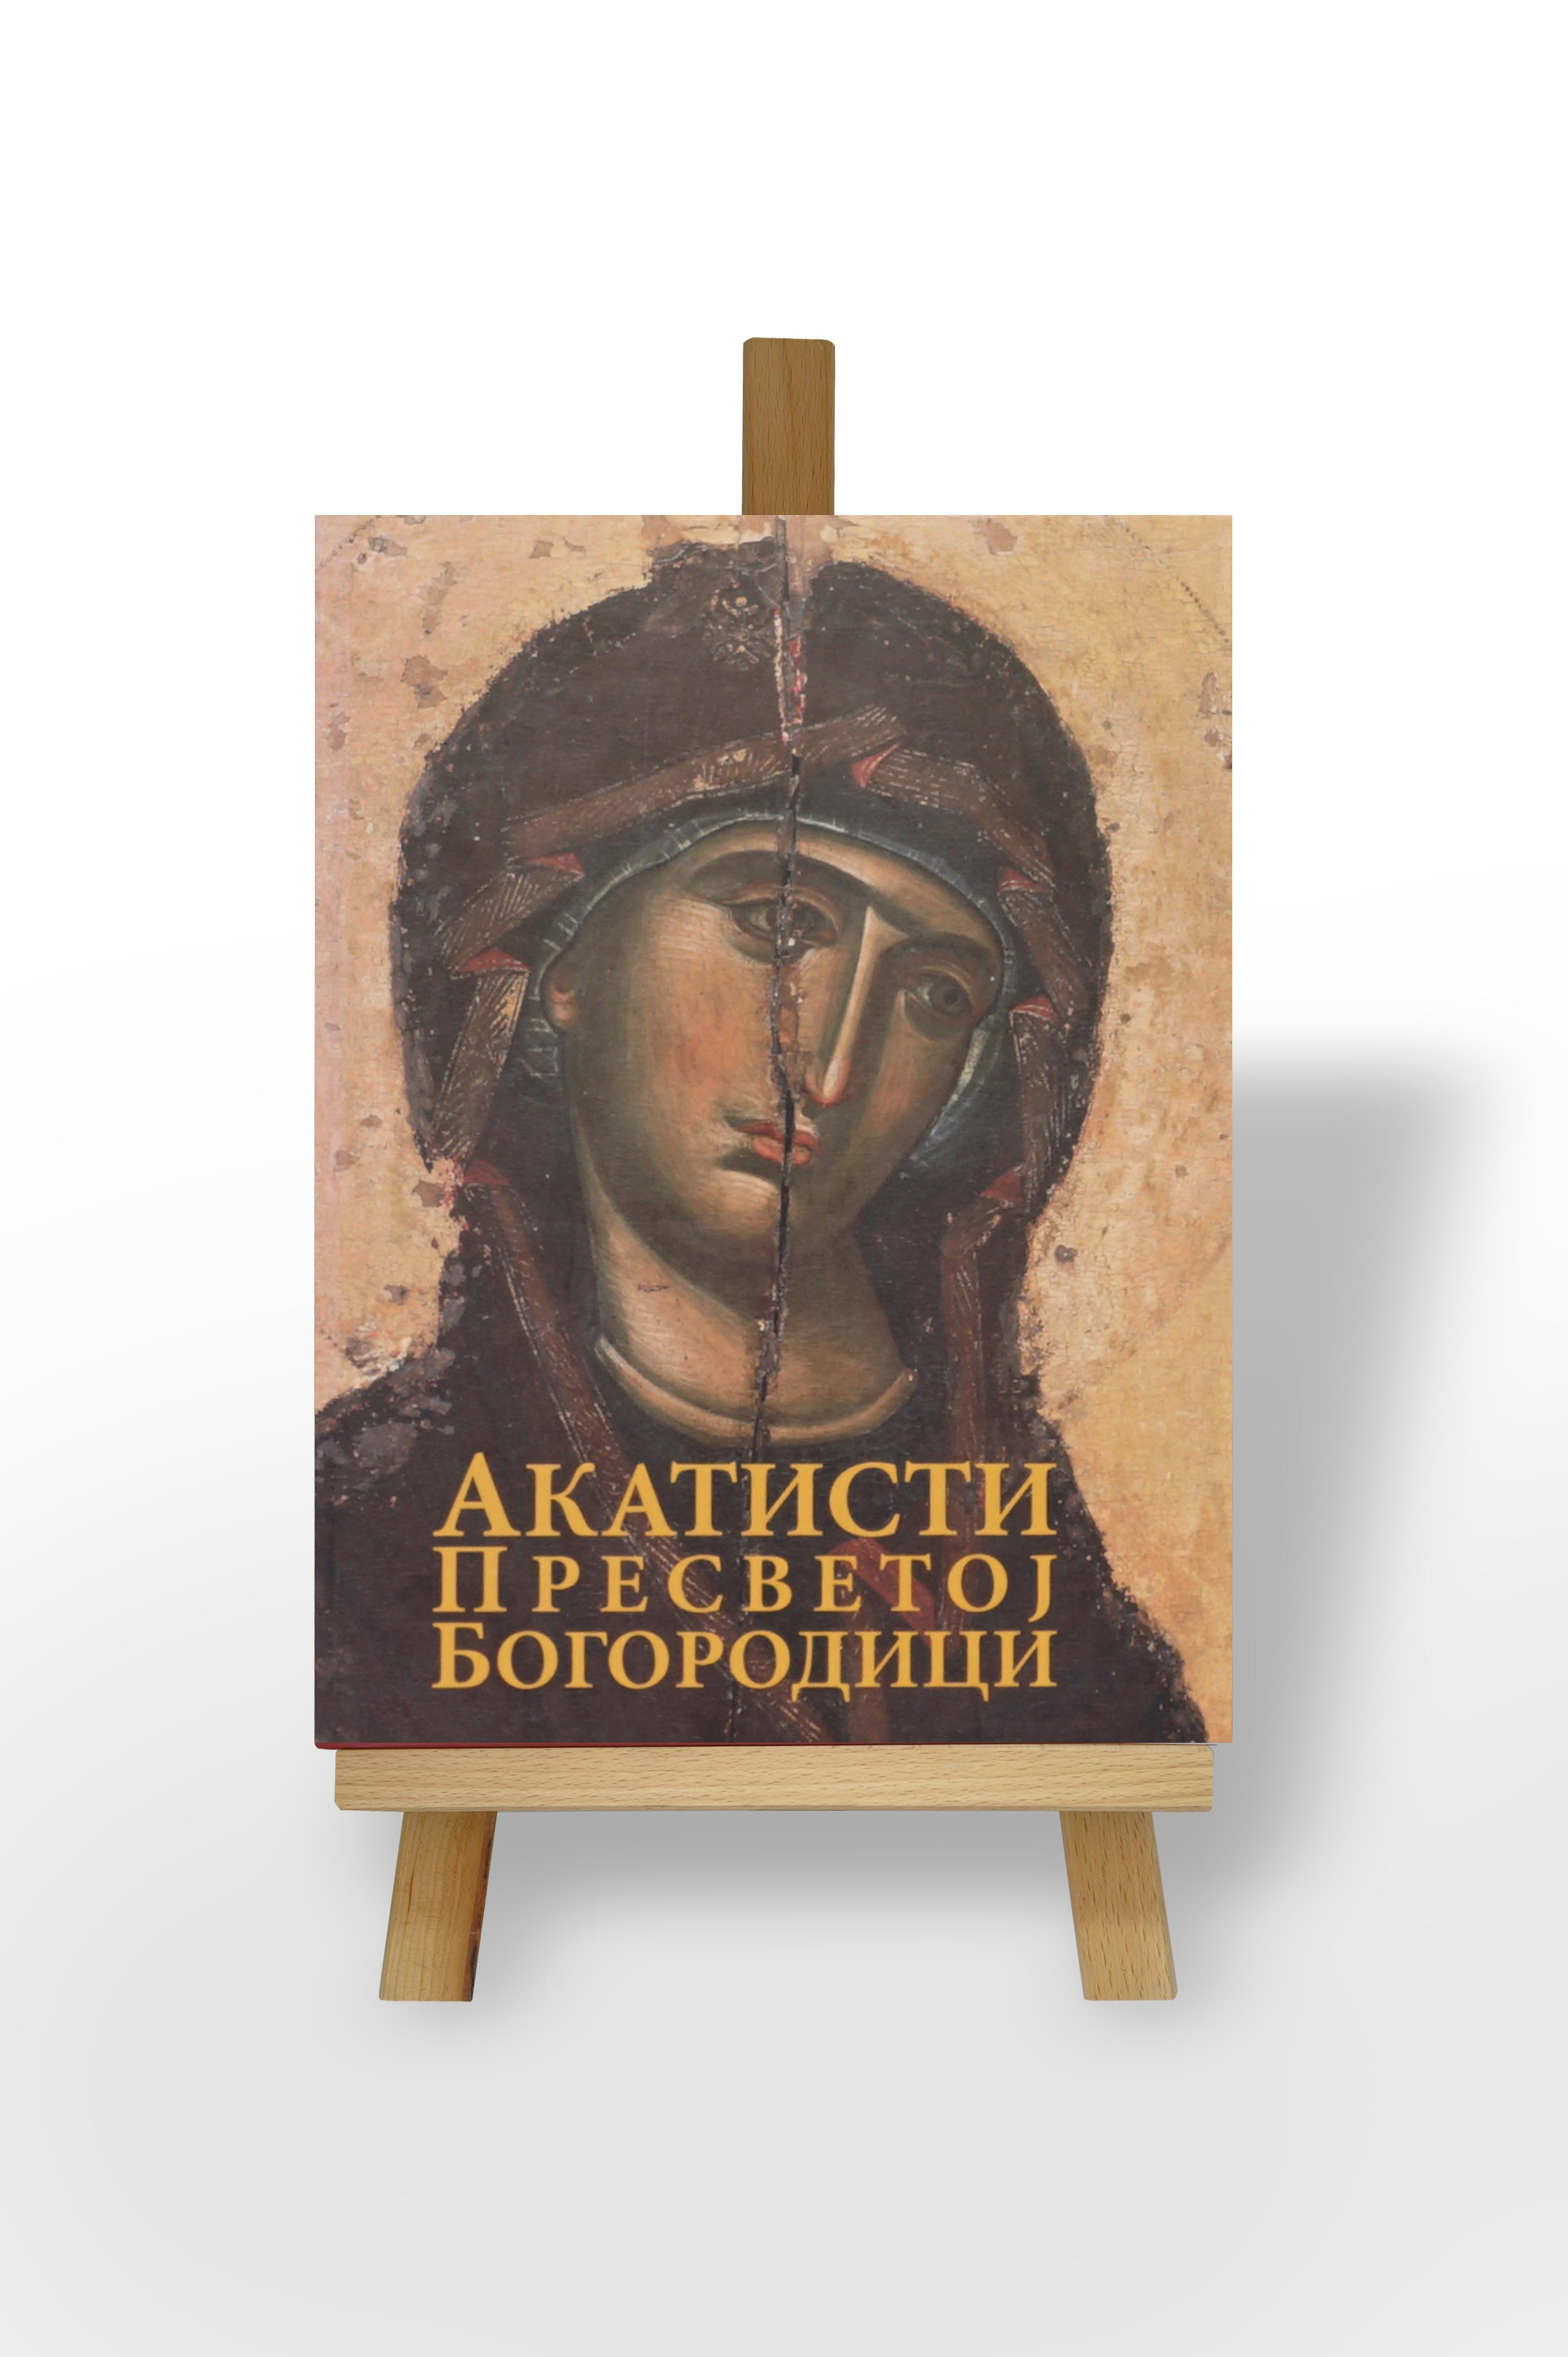 Akatisti Presvetoj Bogorodici